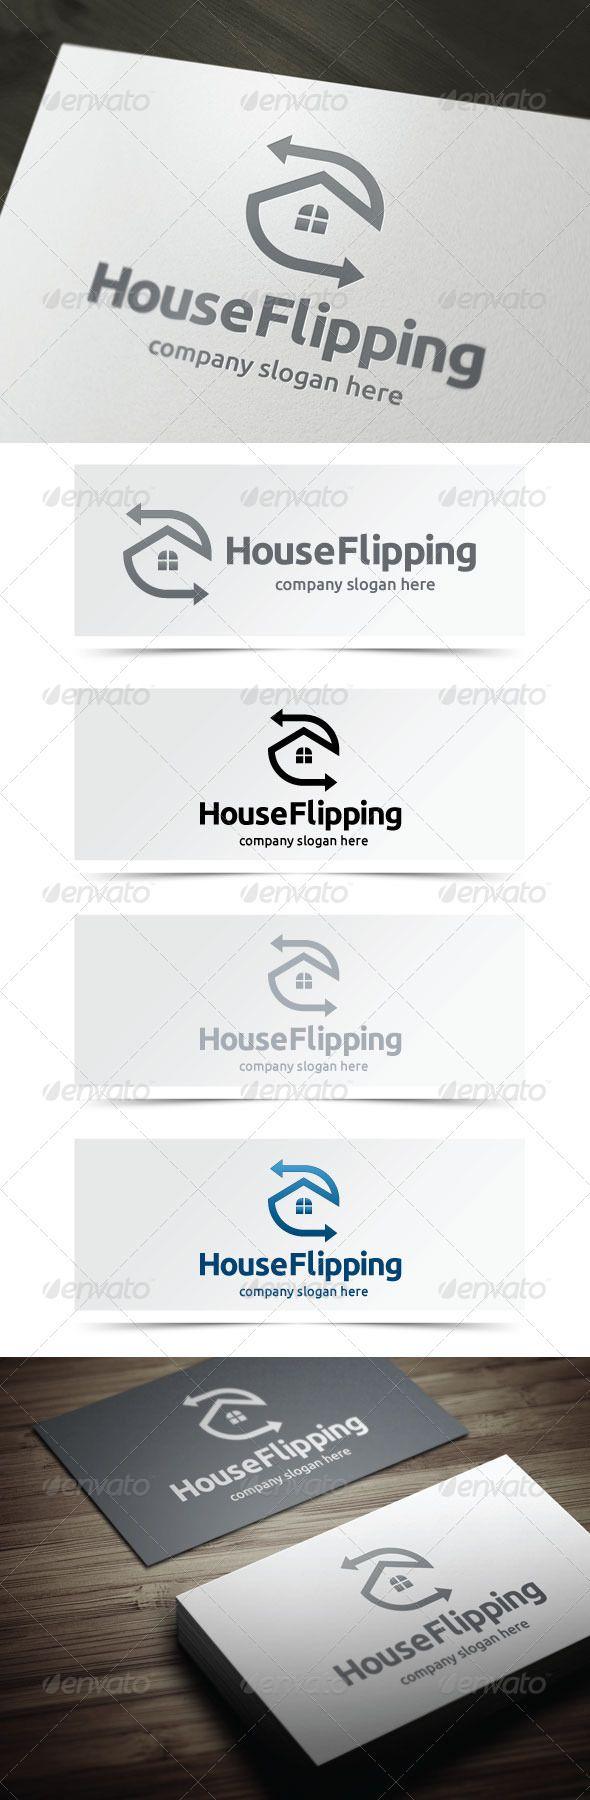 House Flipping Logo Design Template Vector logotype